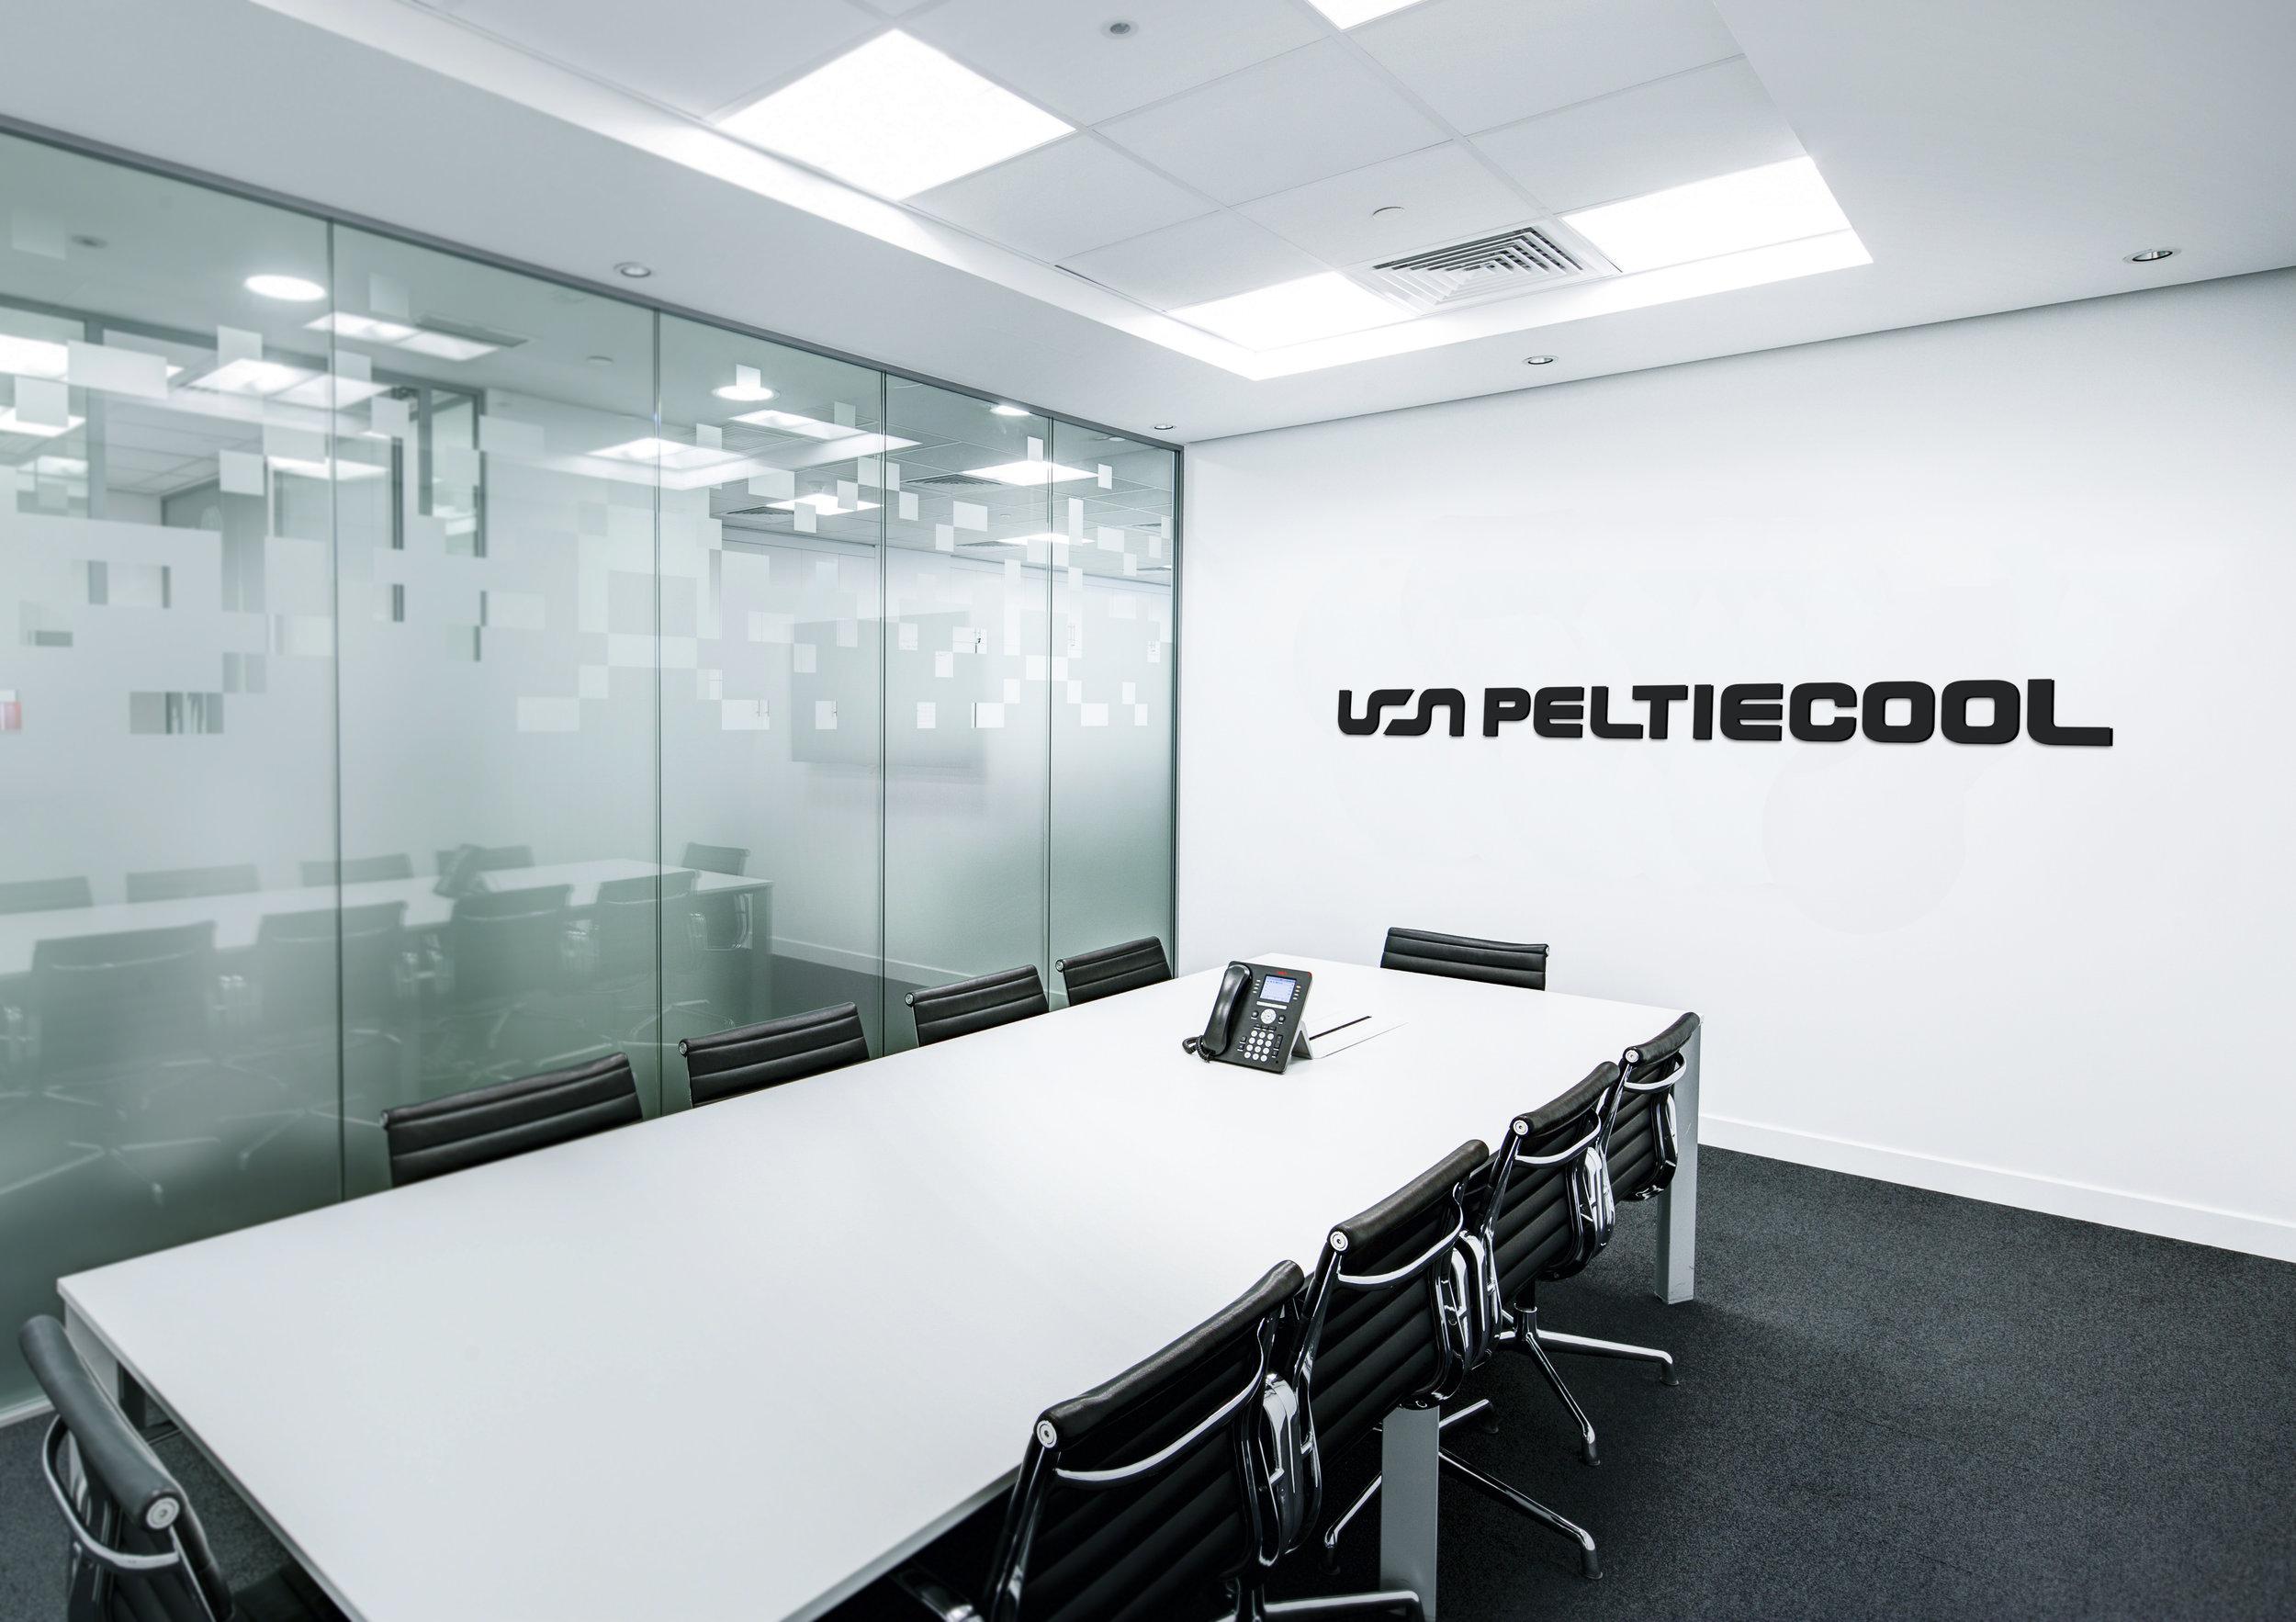 black-and-white-boardroom-ceiling-260689(1).jpg